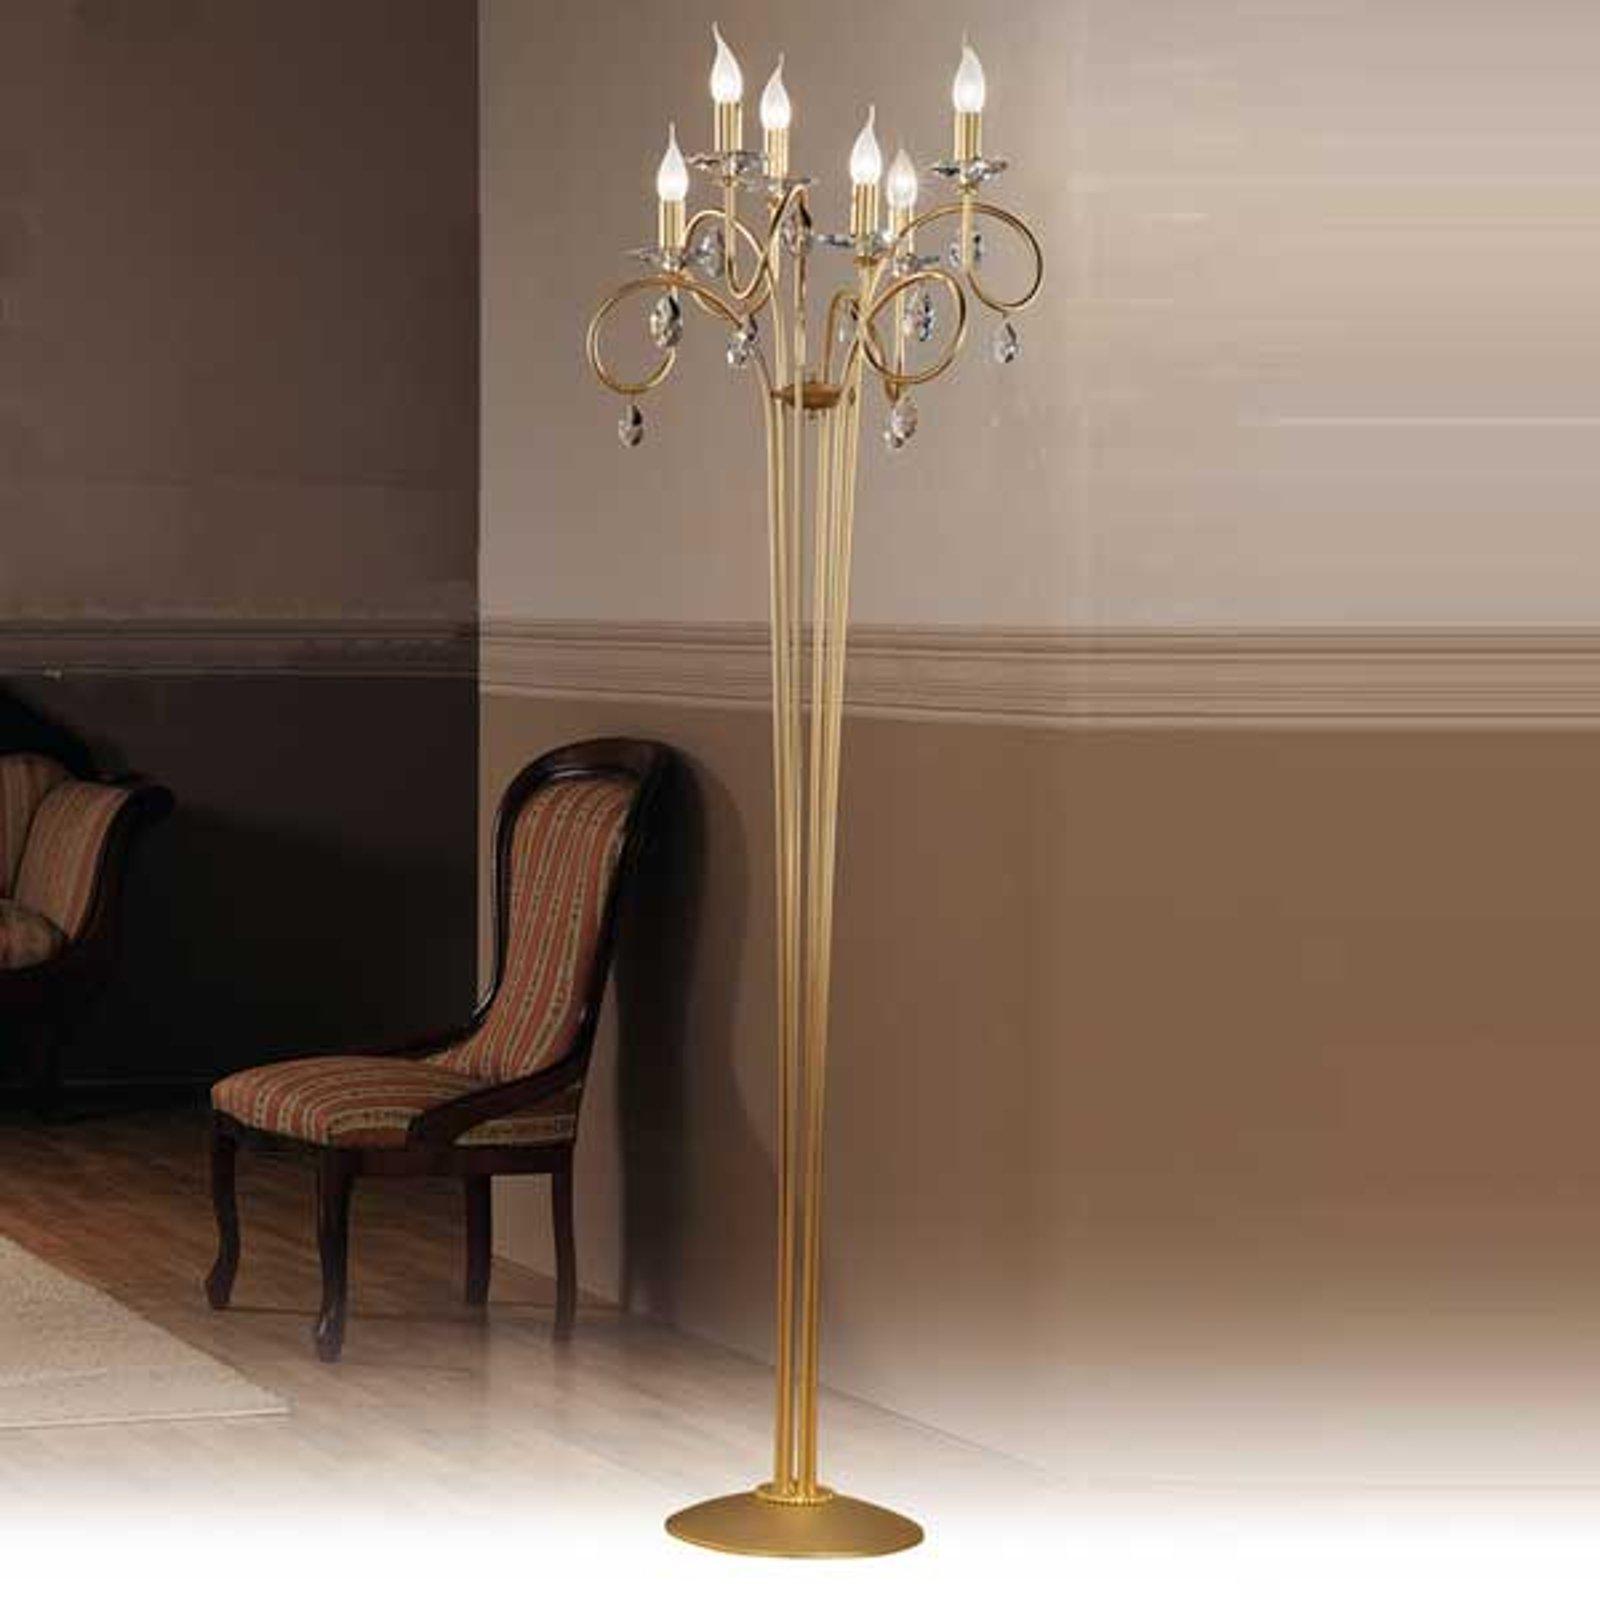 VIOLETTA stålampe i gull med seks lys